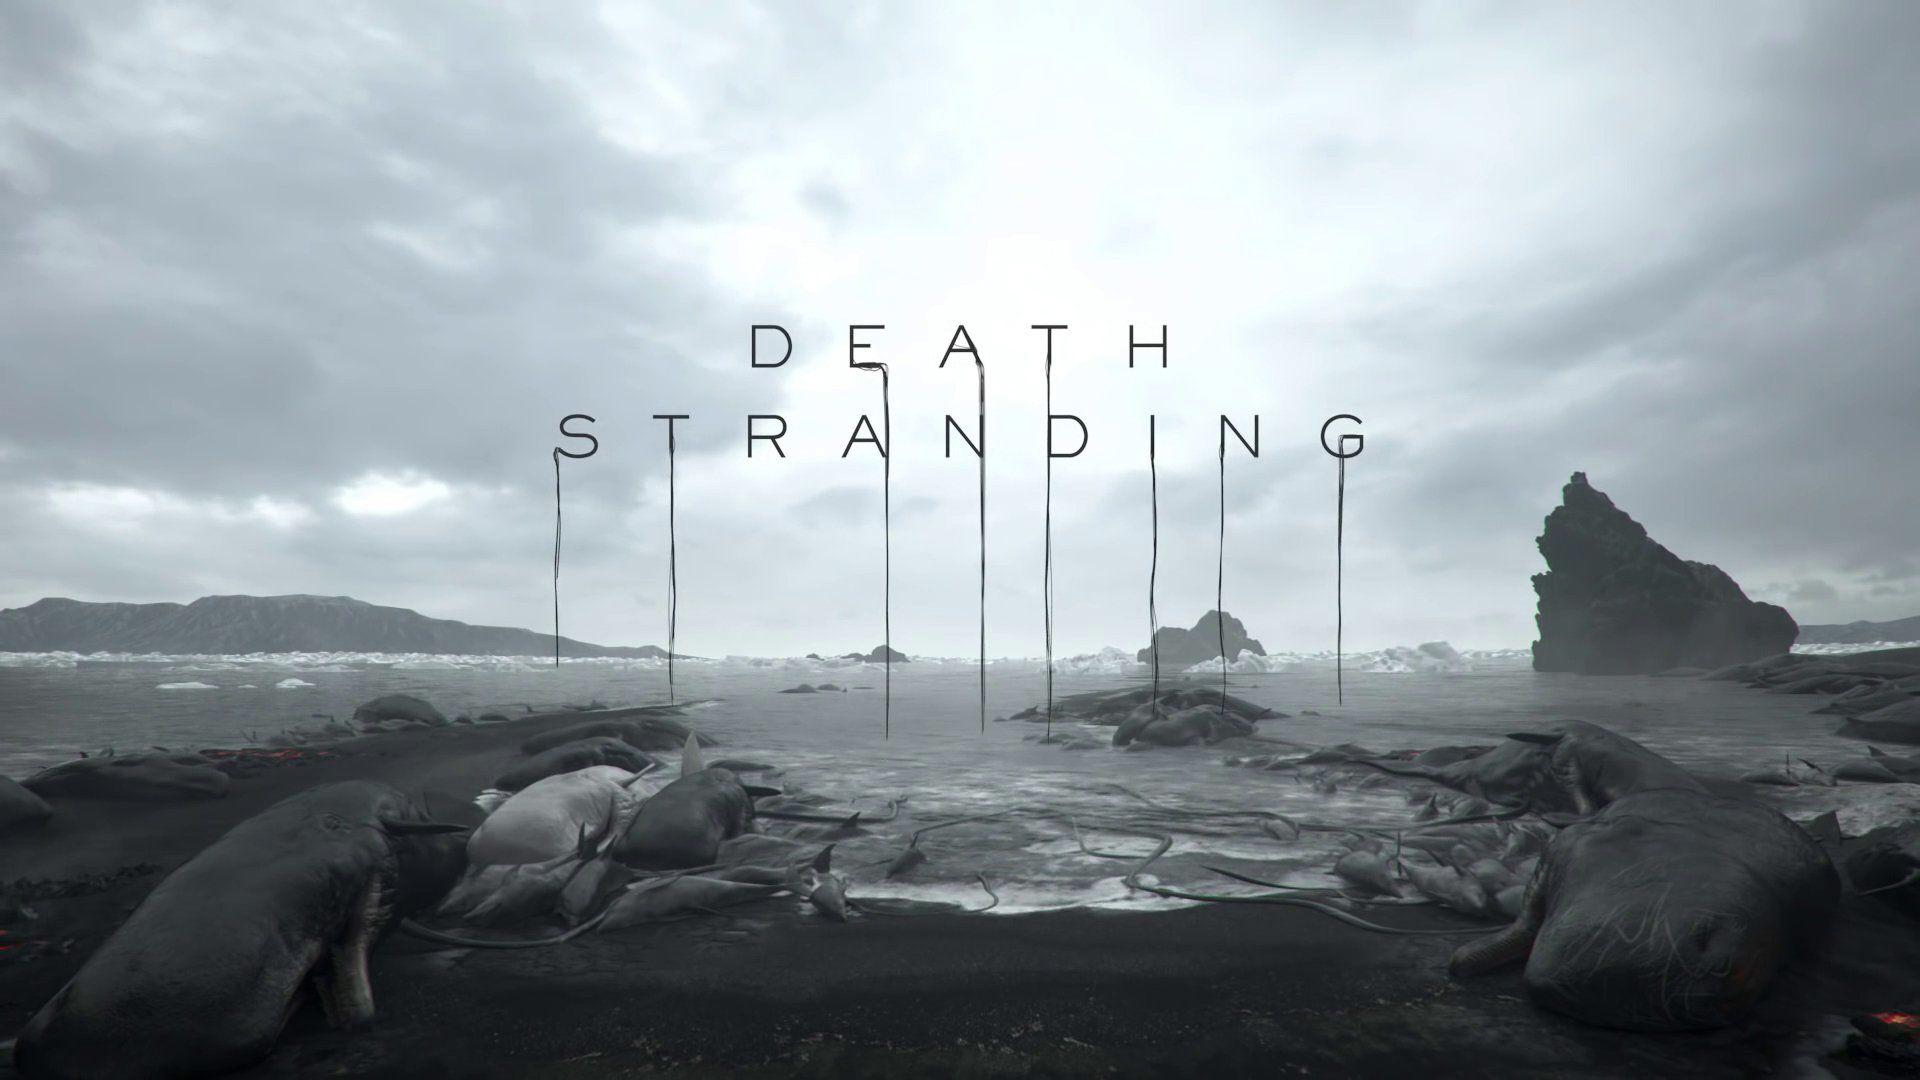 death stranding ringtone